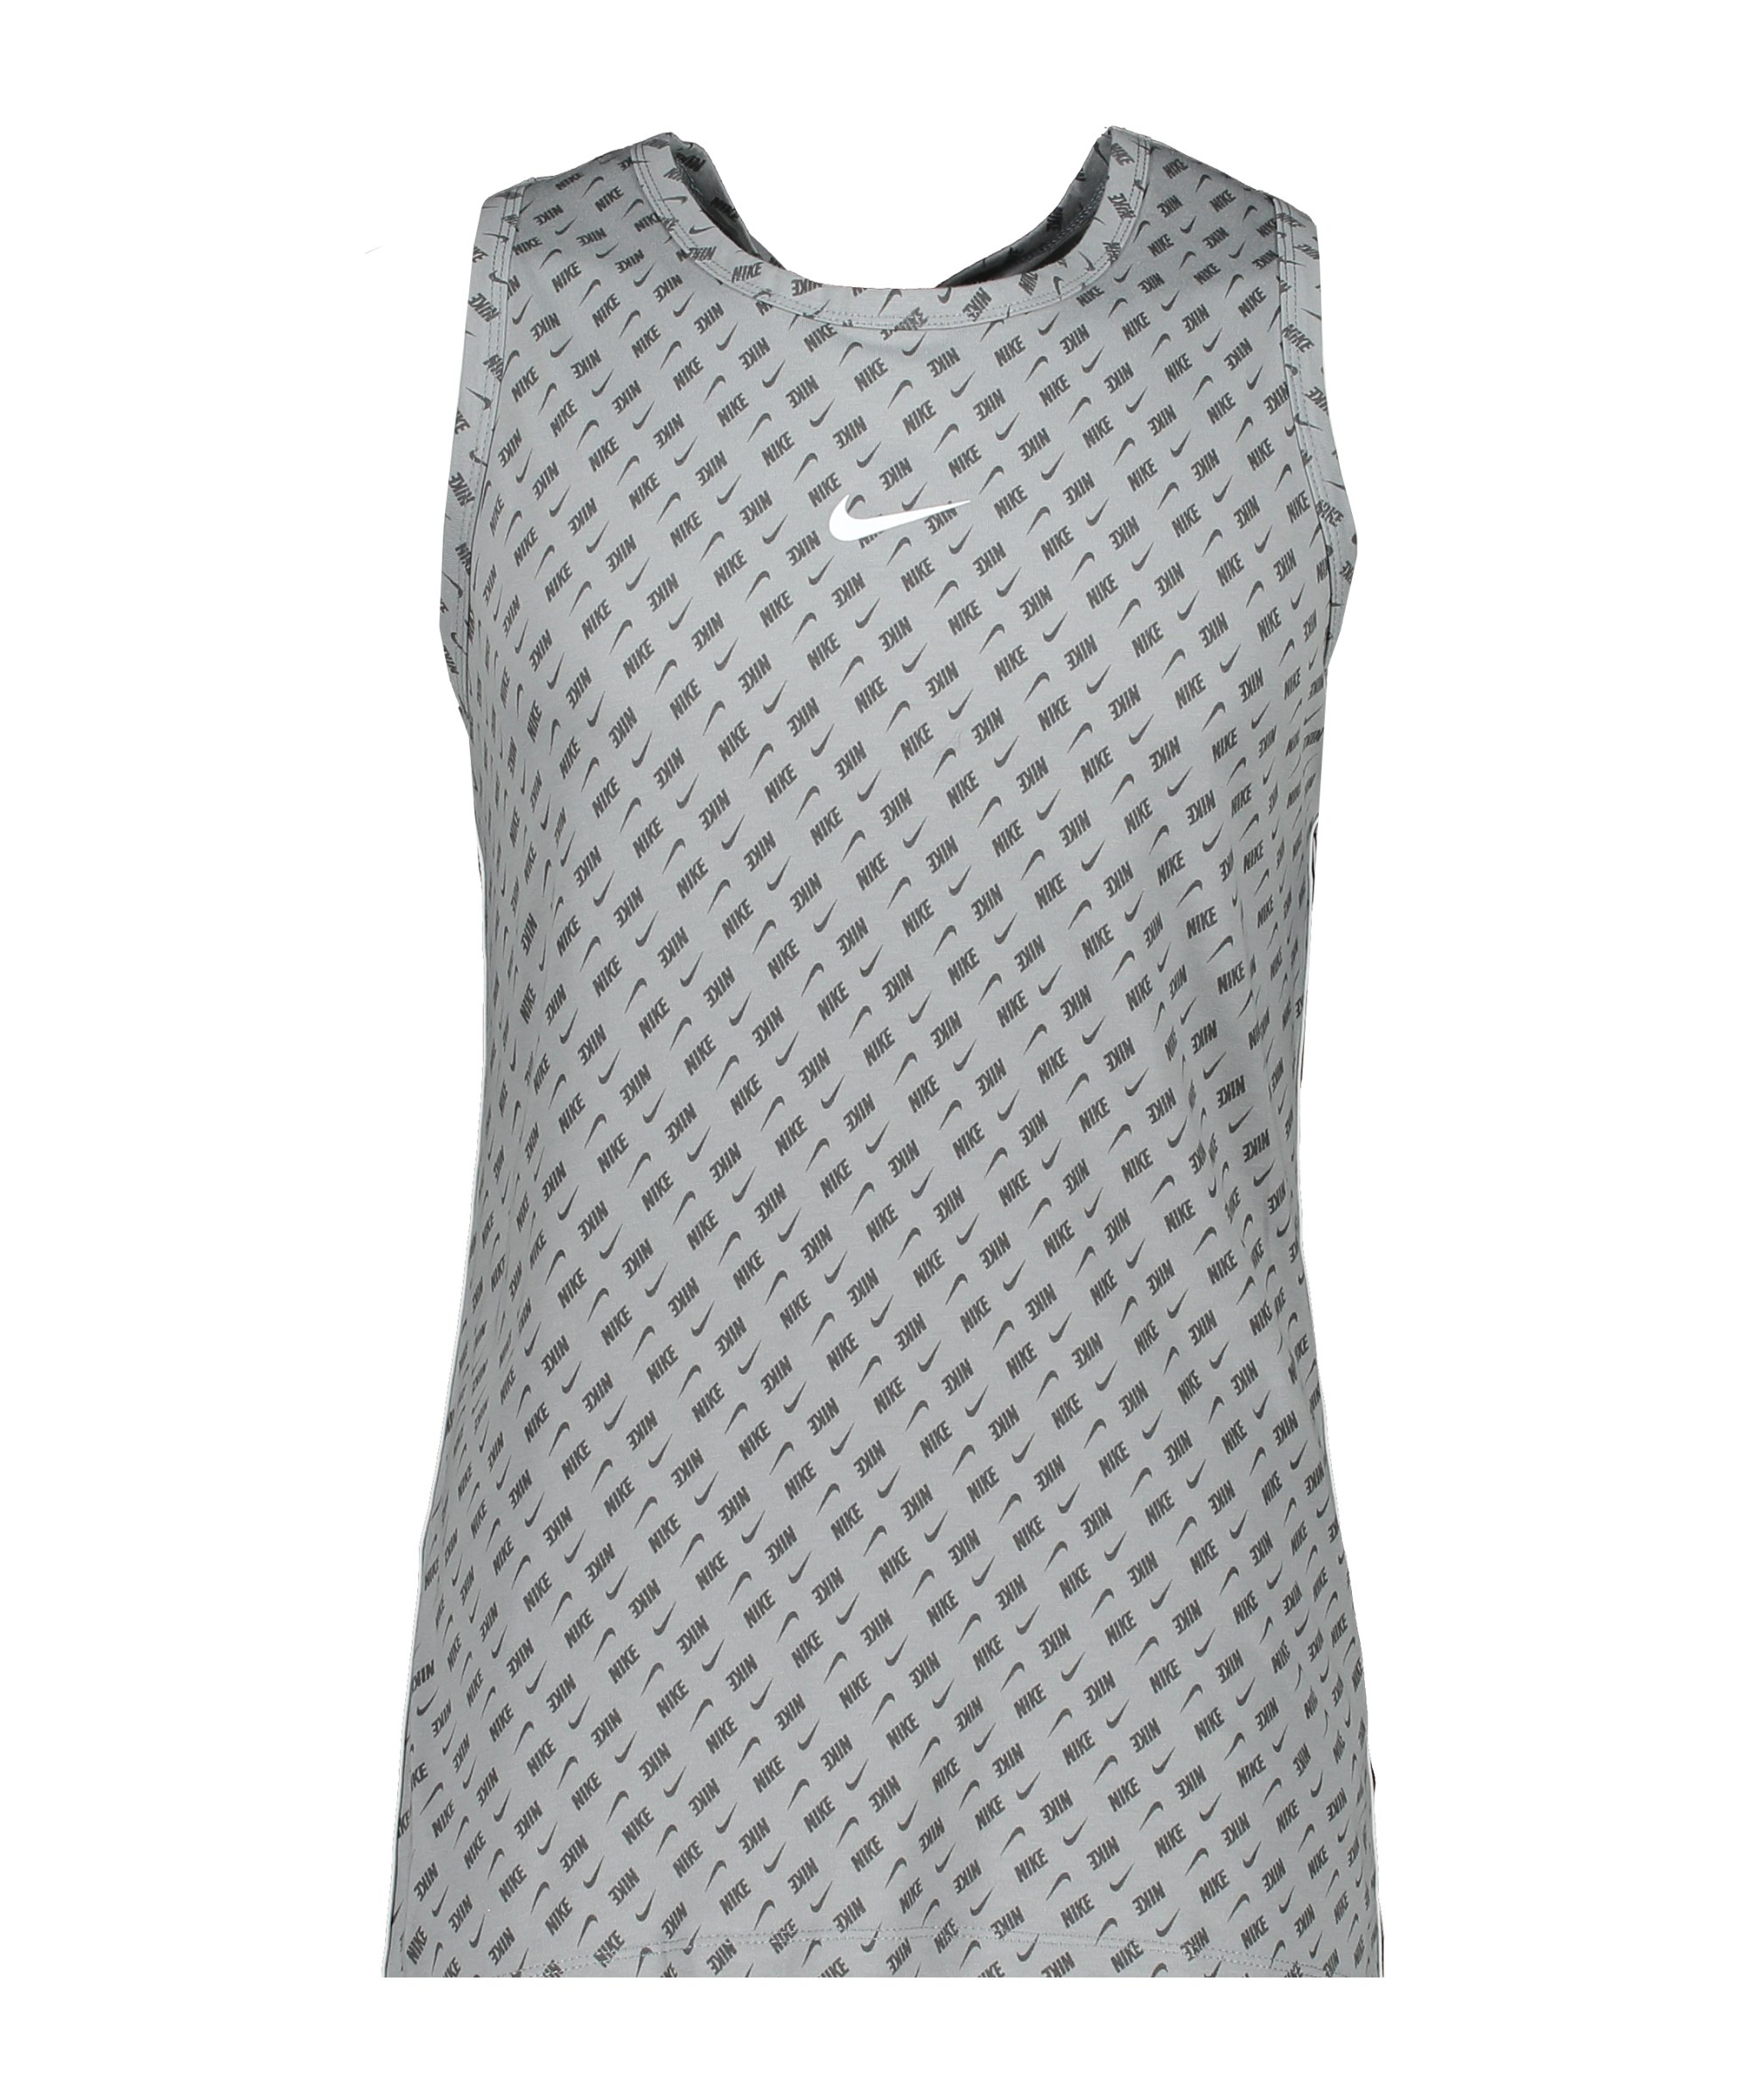 Nike Repeat Print Tanktop Grau F073 - grau